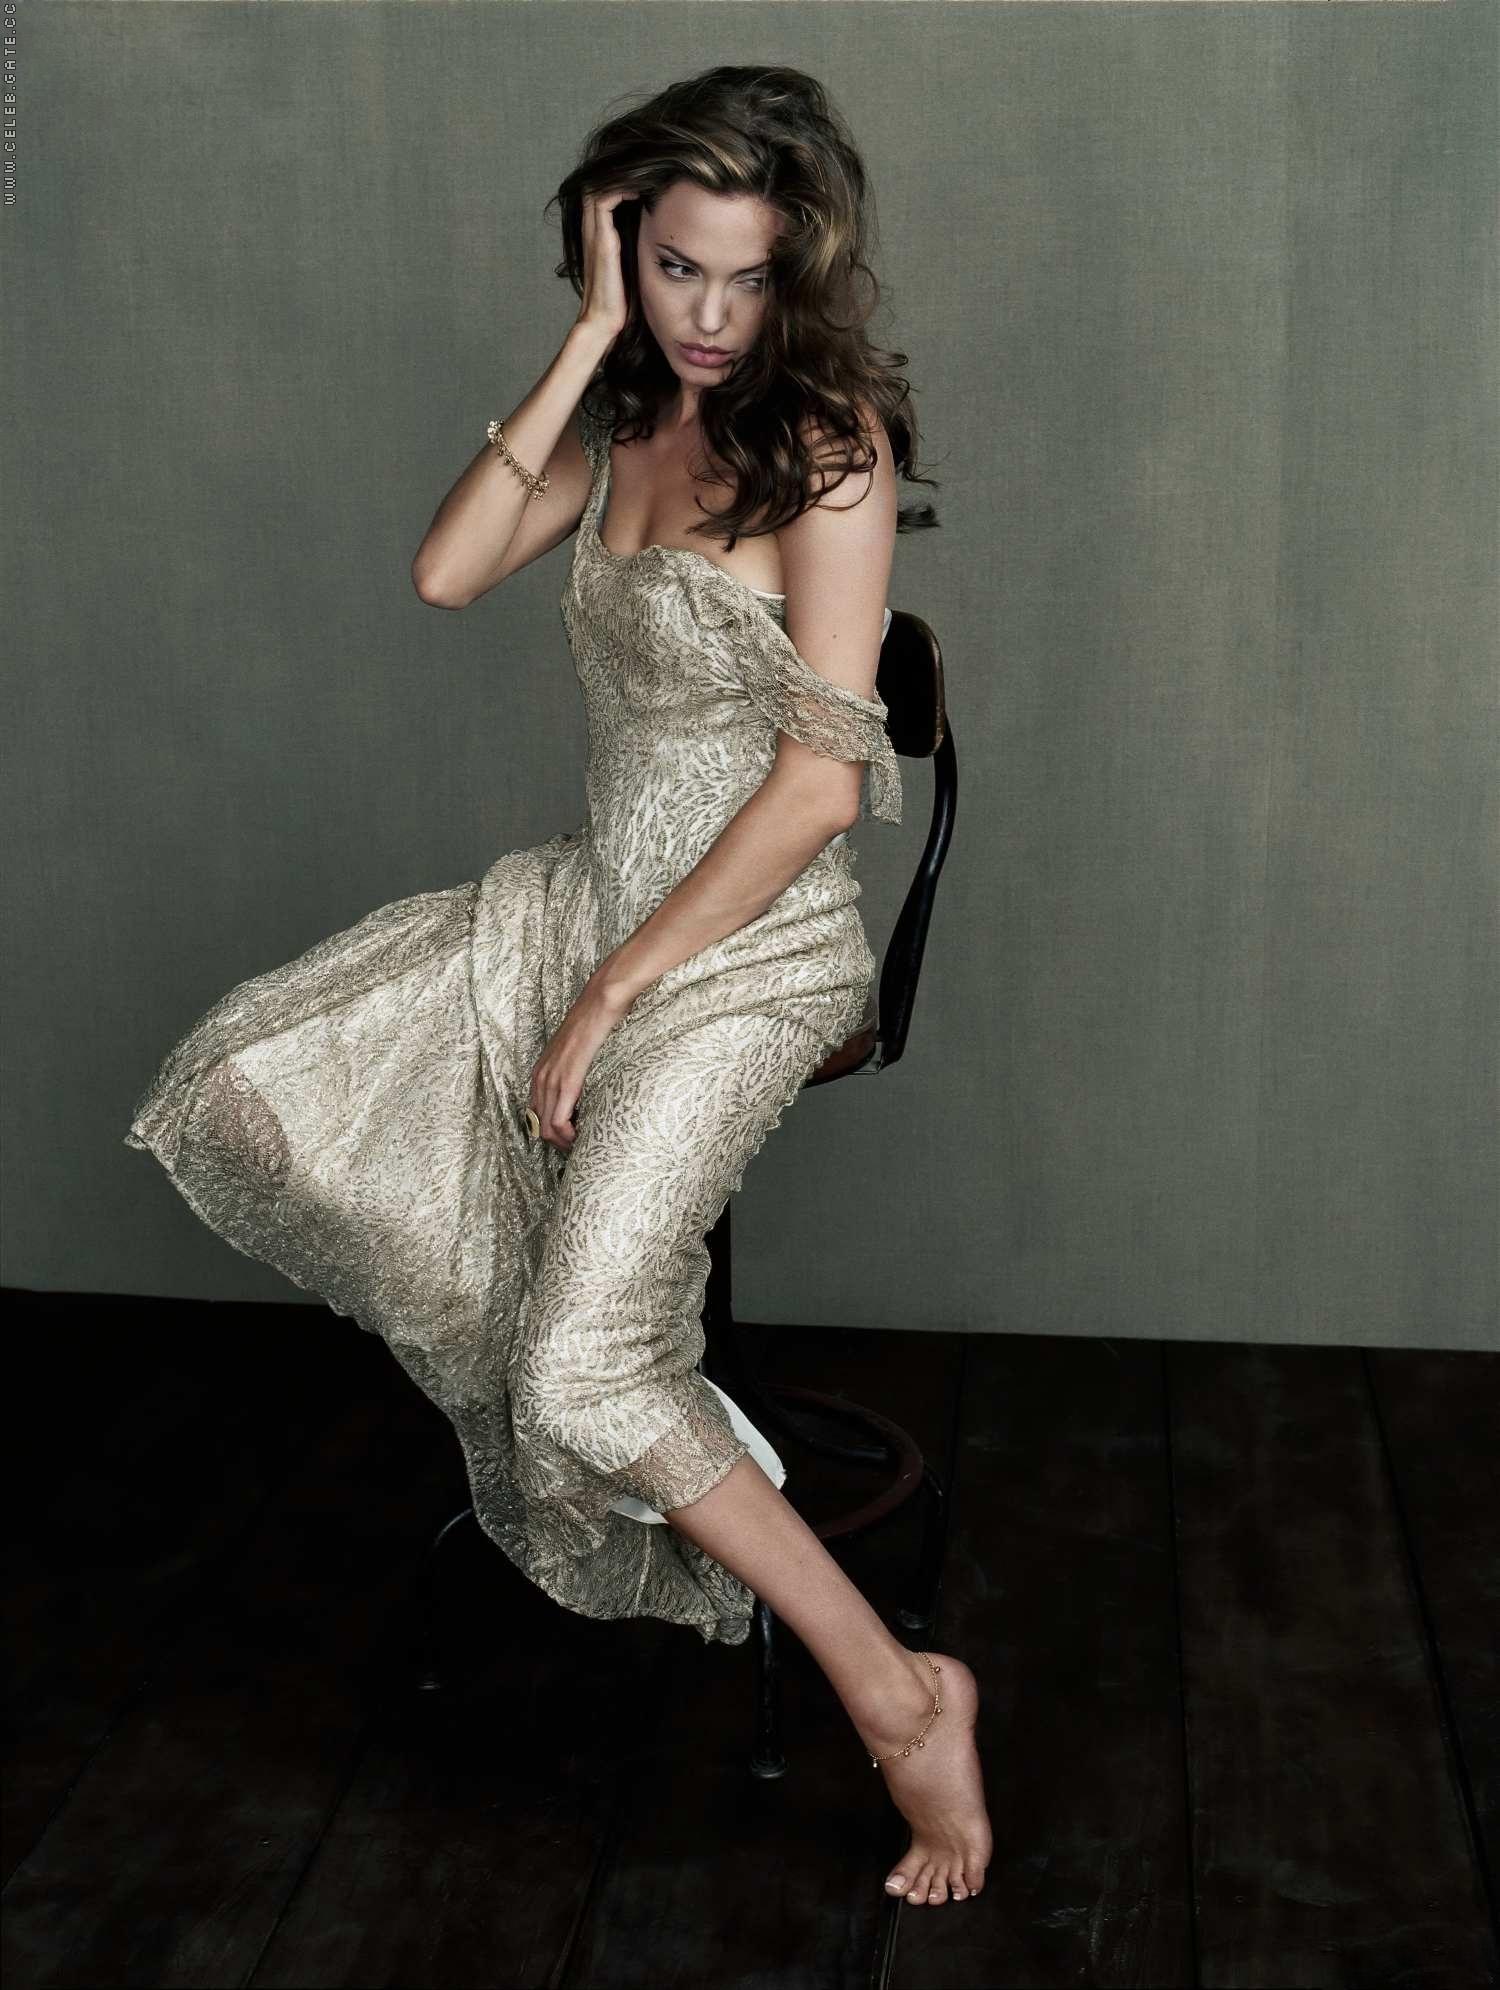 Angelina Jolie Sexy Feet 64